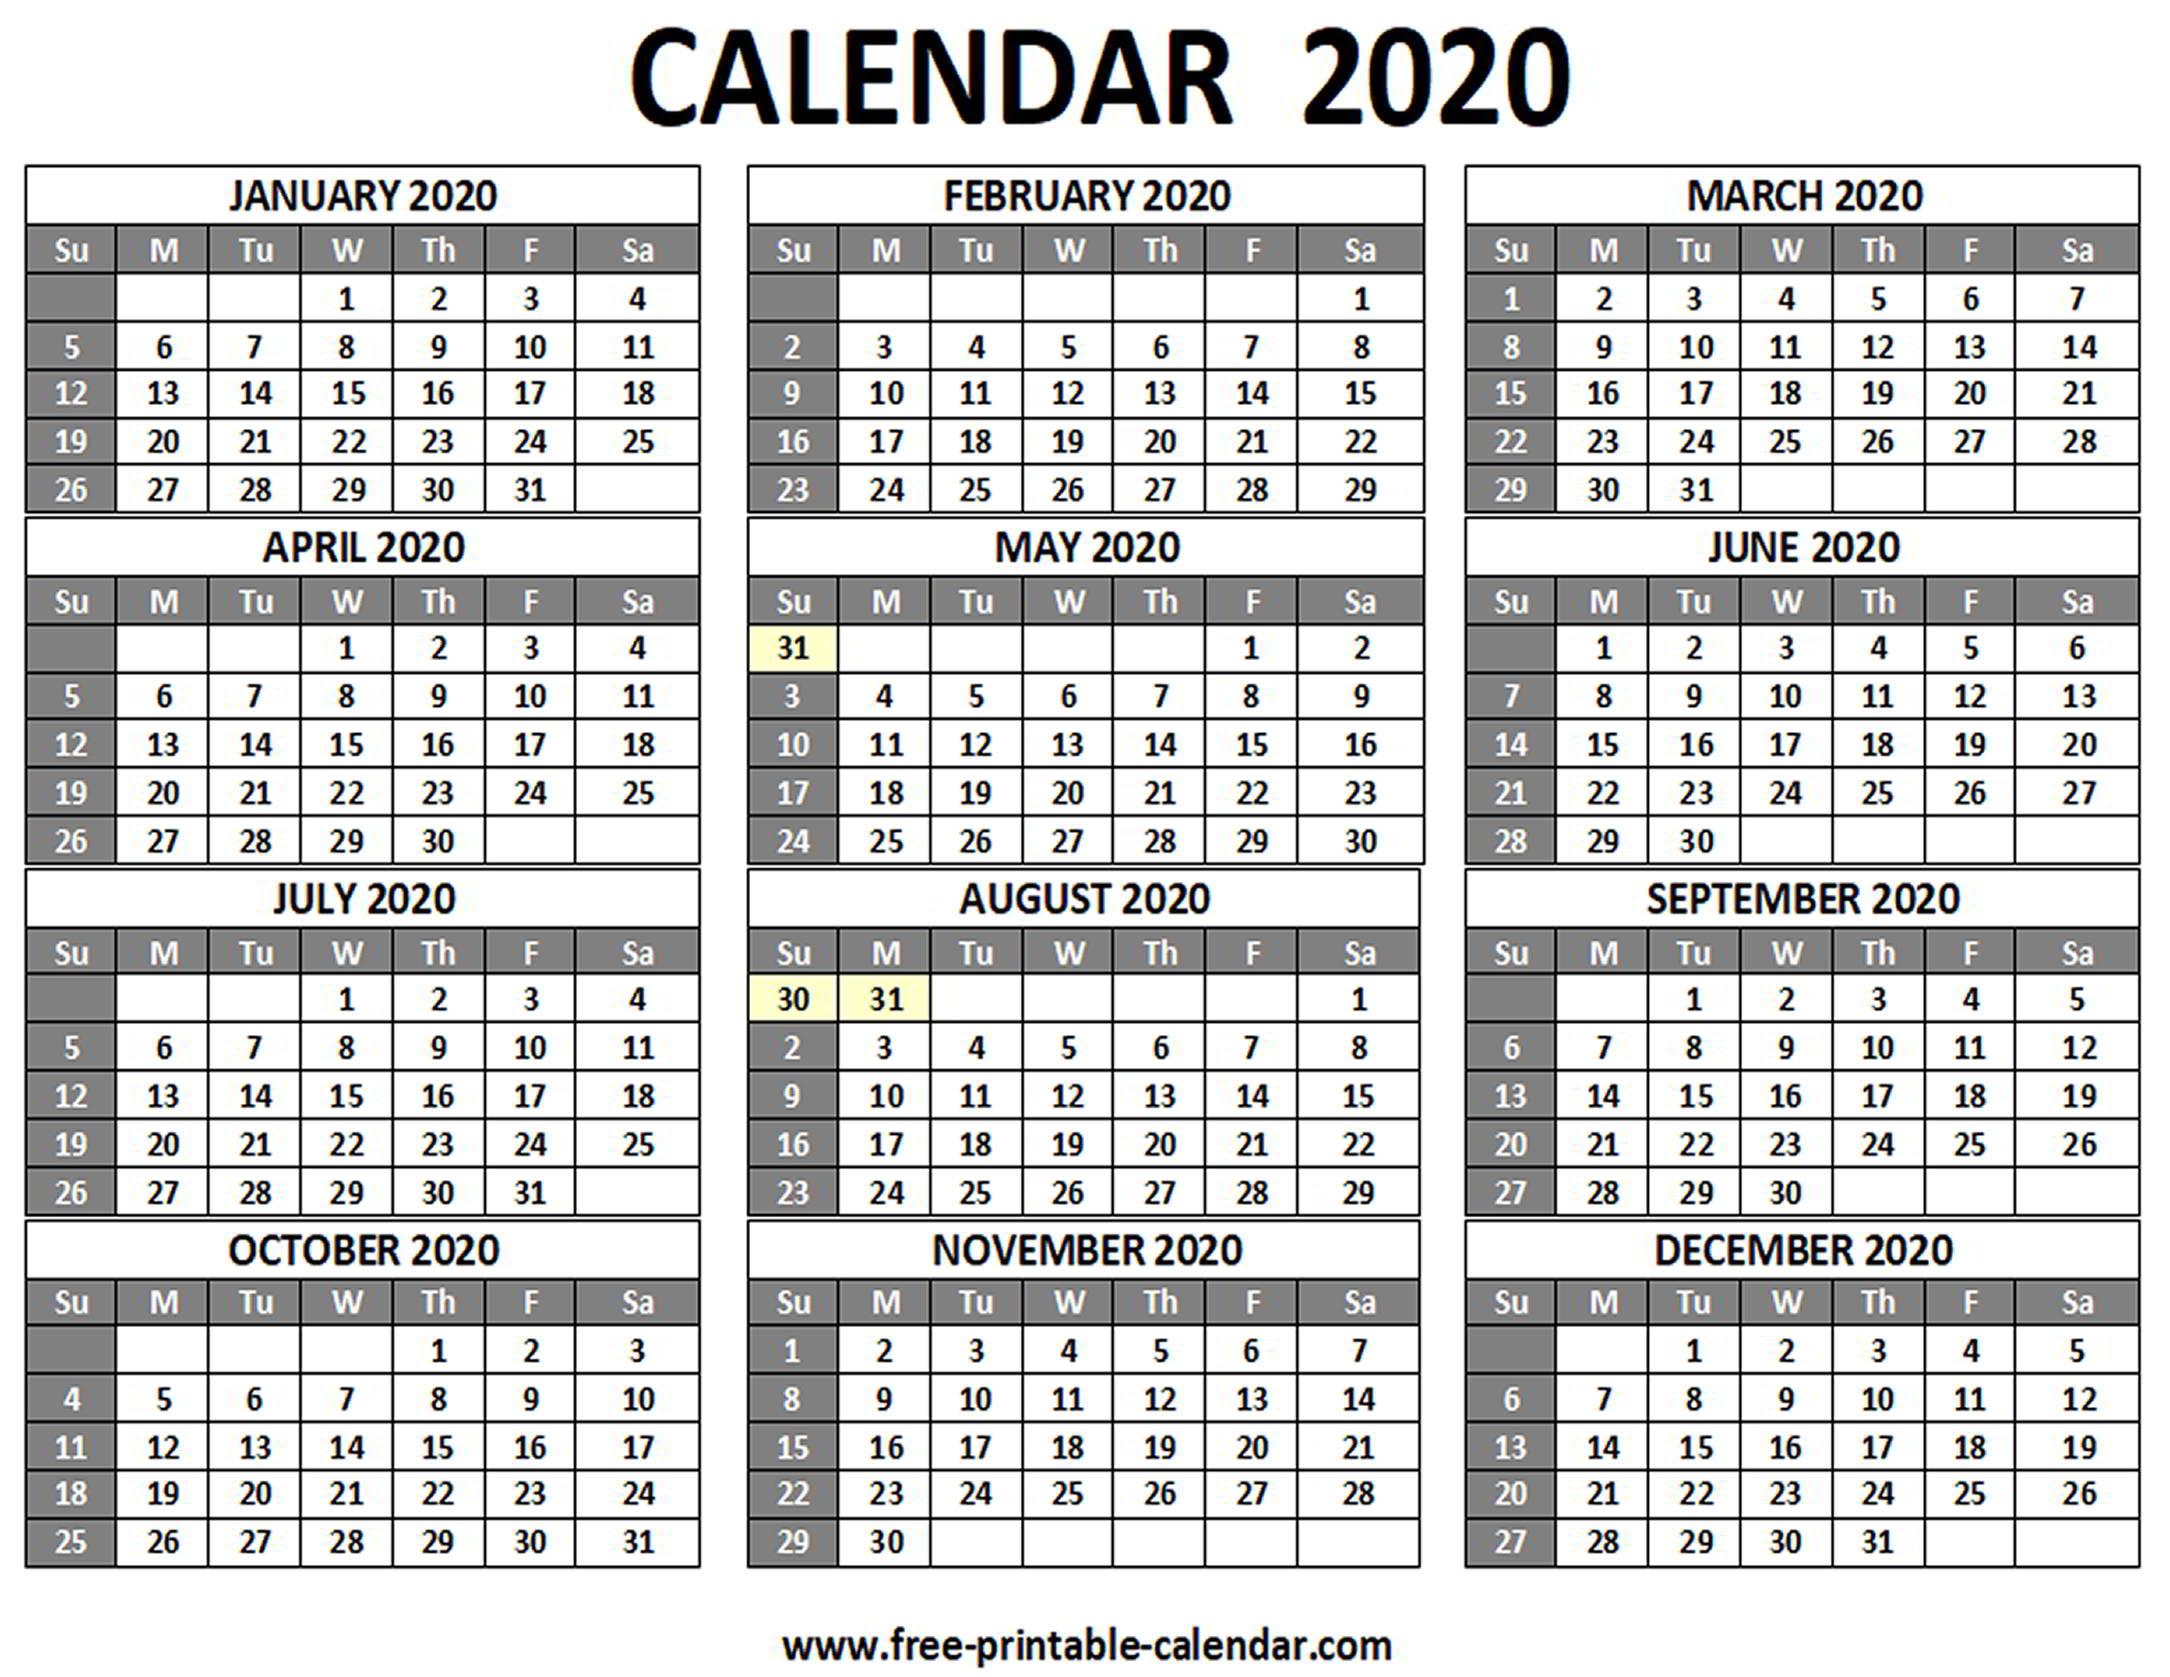 Printable 2020 Calendar - Free-Printable-Calendar in Free Printable 2020 Calendar To I Can Edit